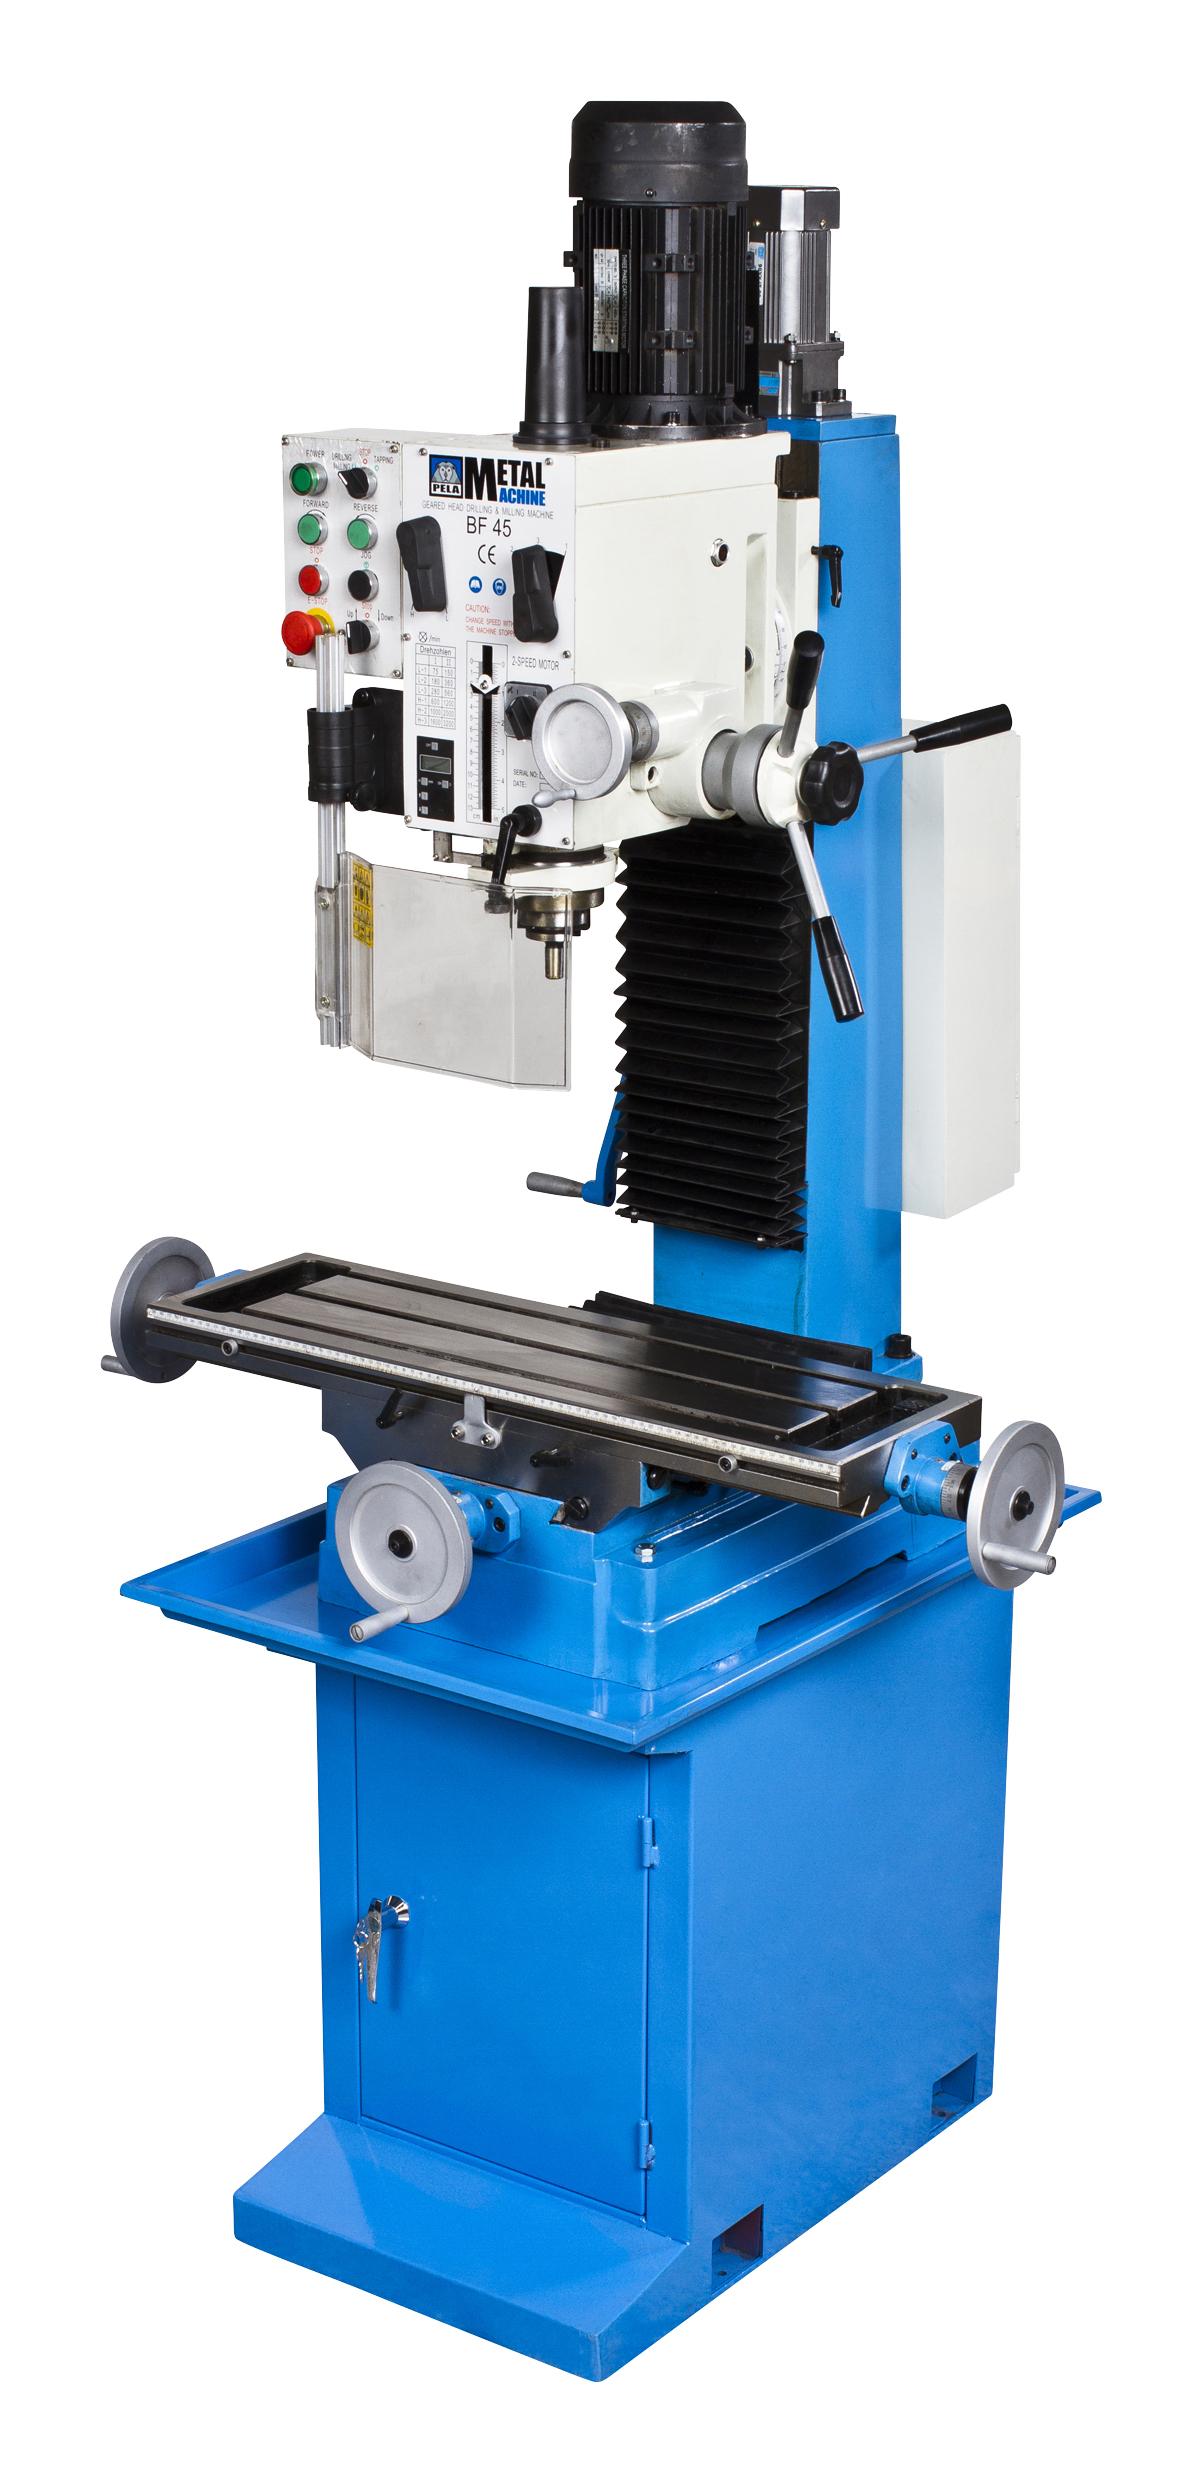 Buy Drill & milling machine BF45 Digital at Pela Tools